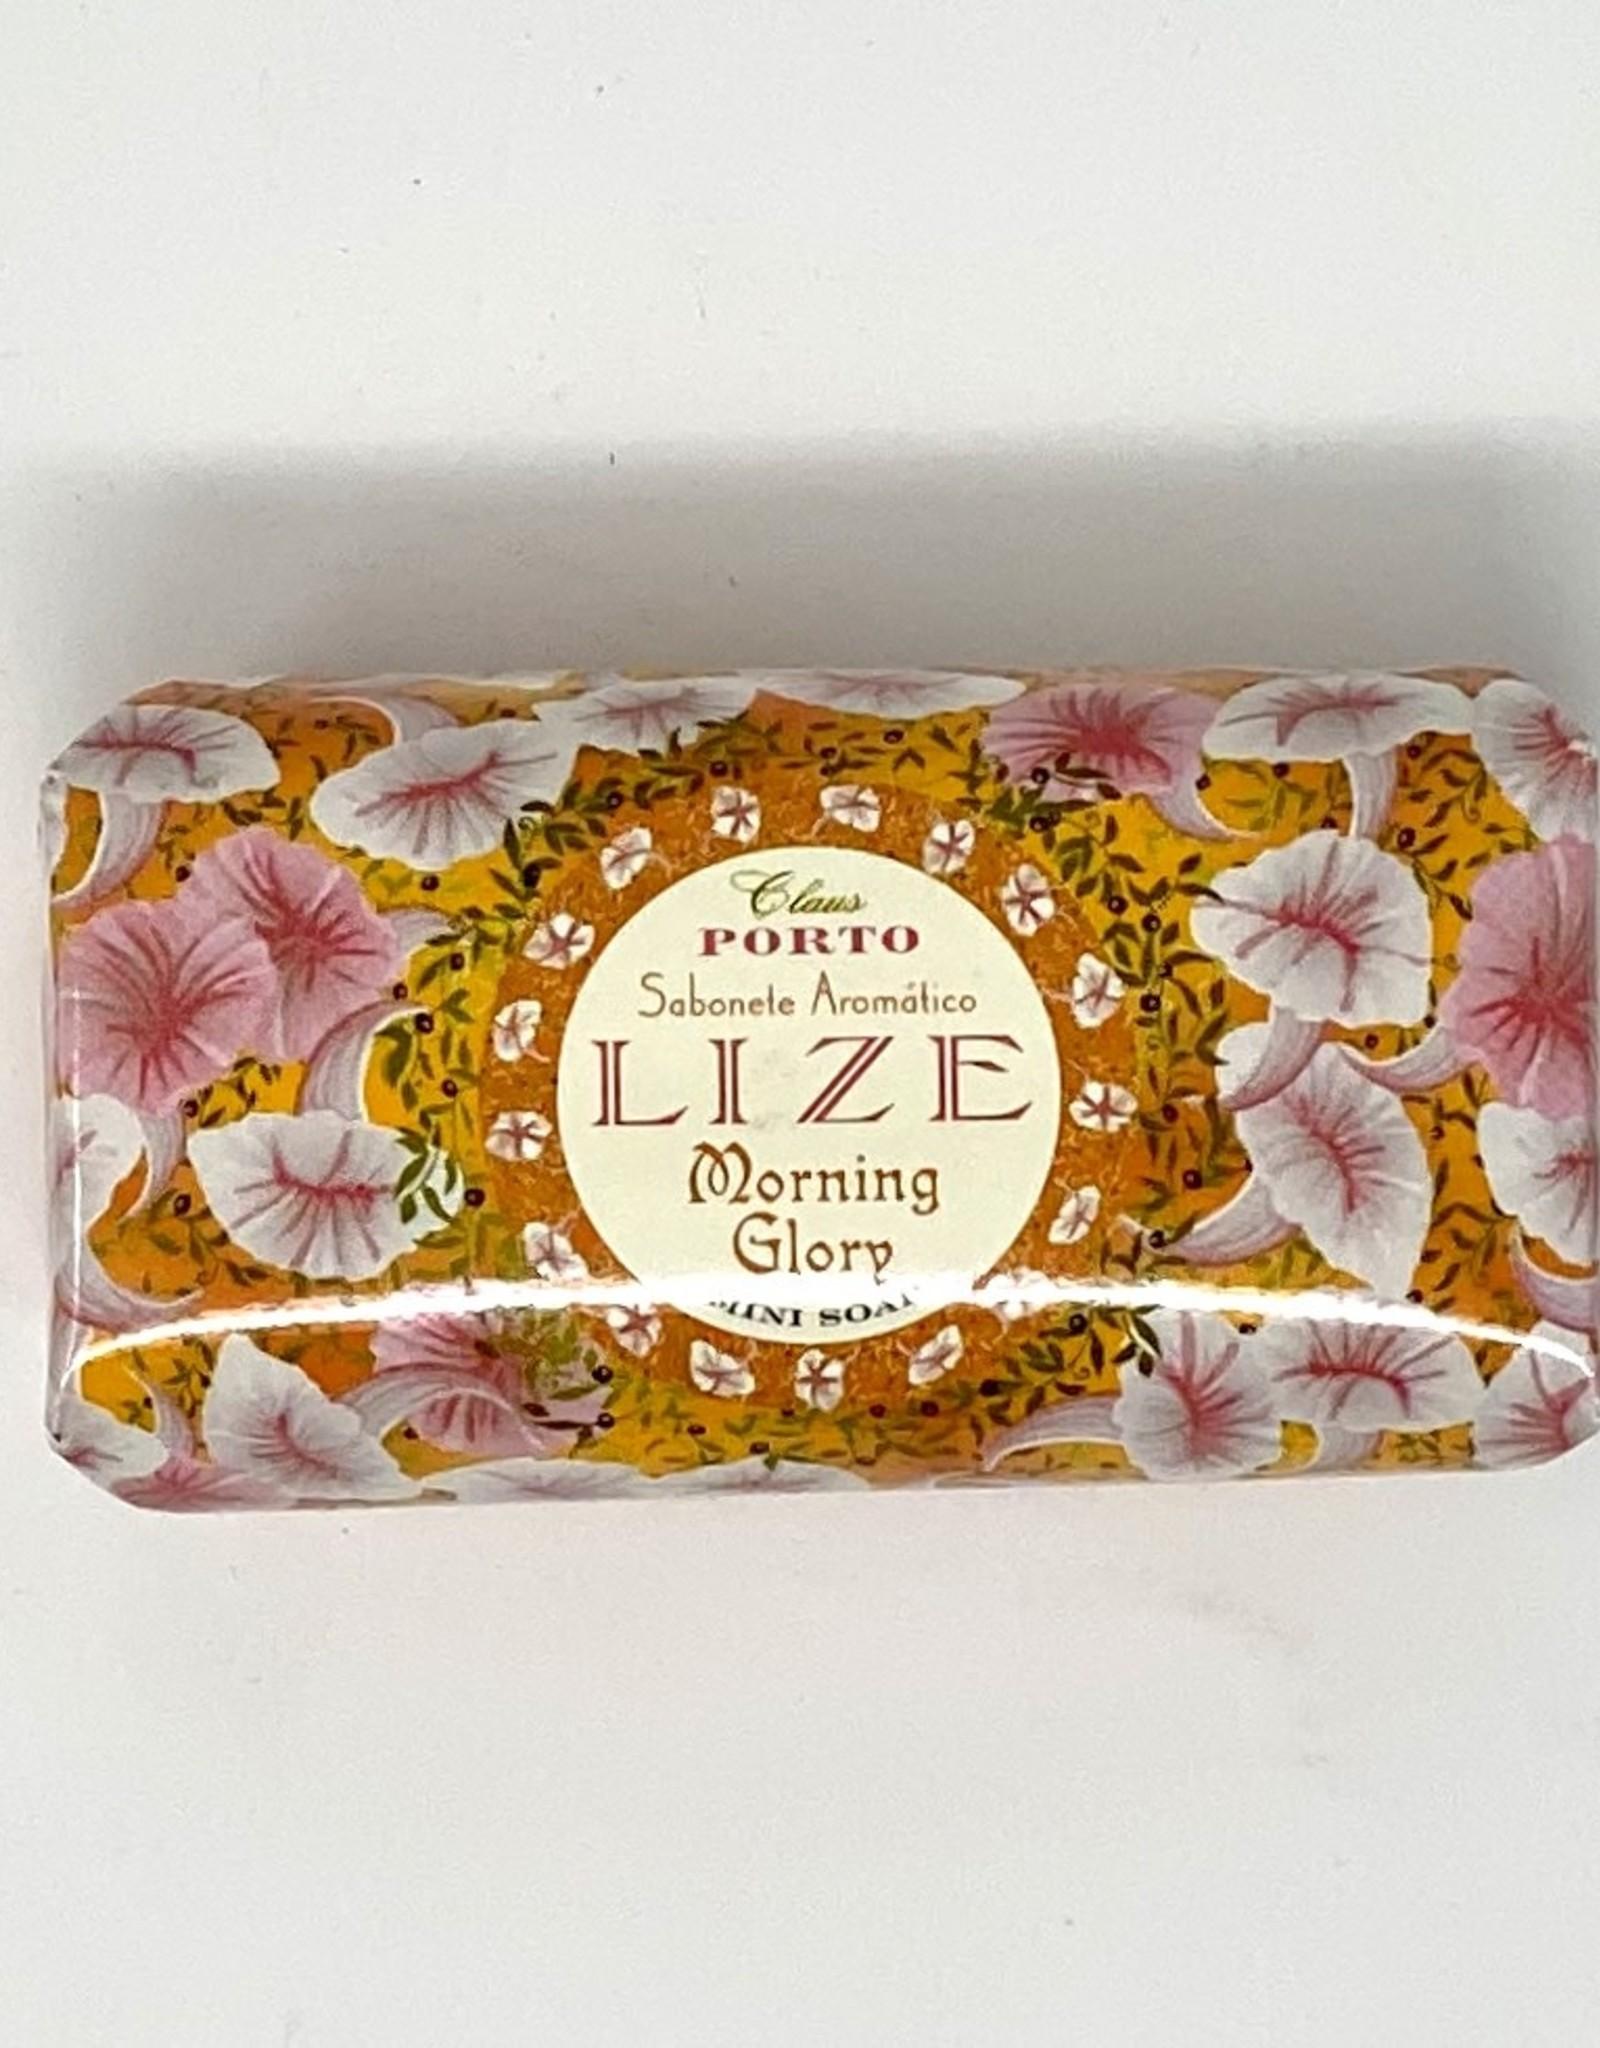 ClPo Lize Mini Bar Soap